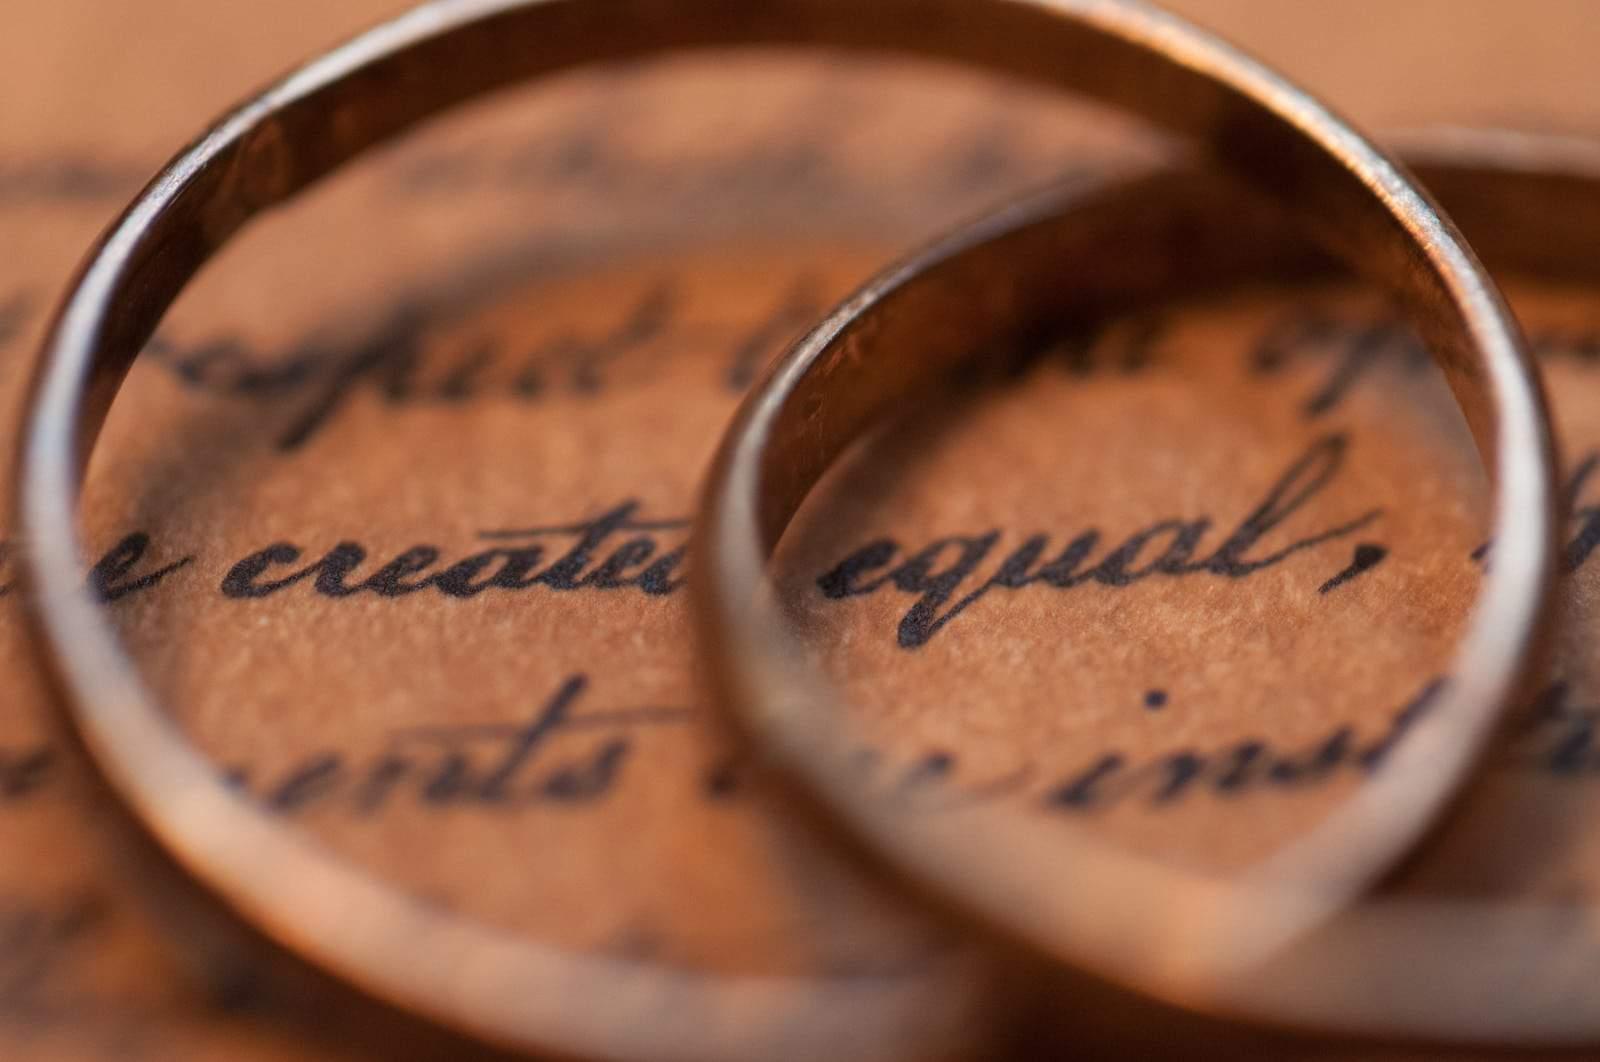 Rich-Vaughn-Blog-SCOTUS-Marriage